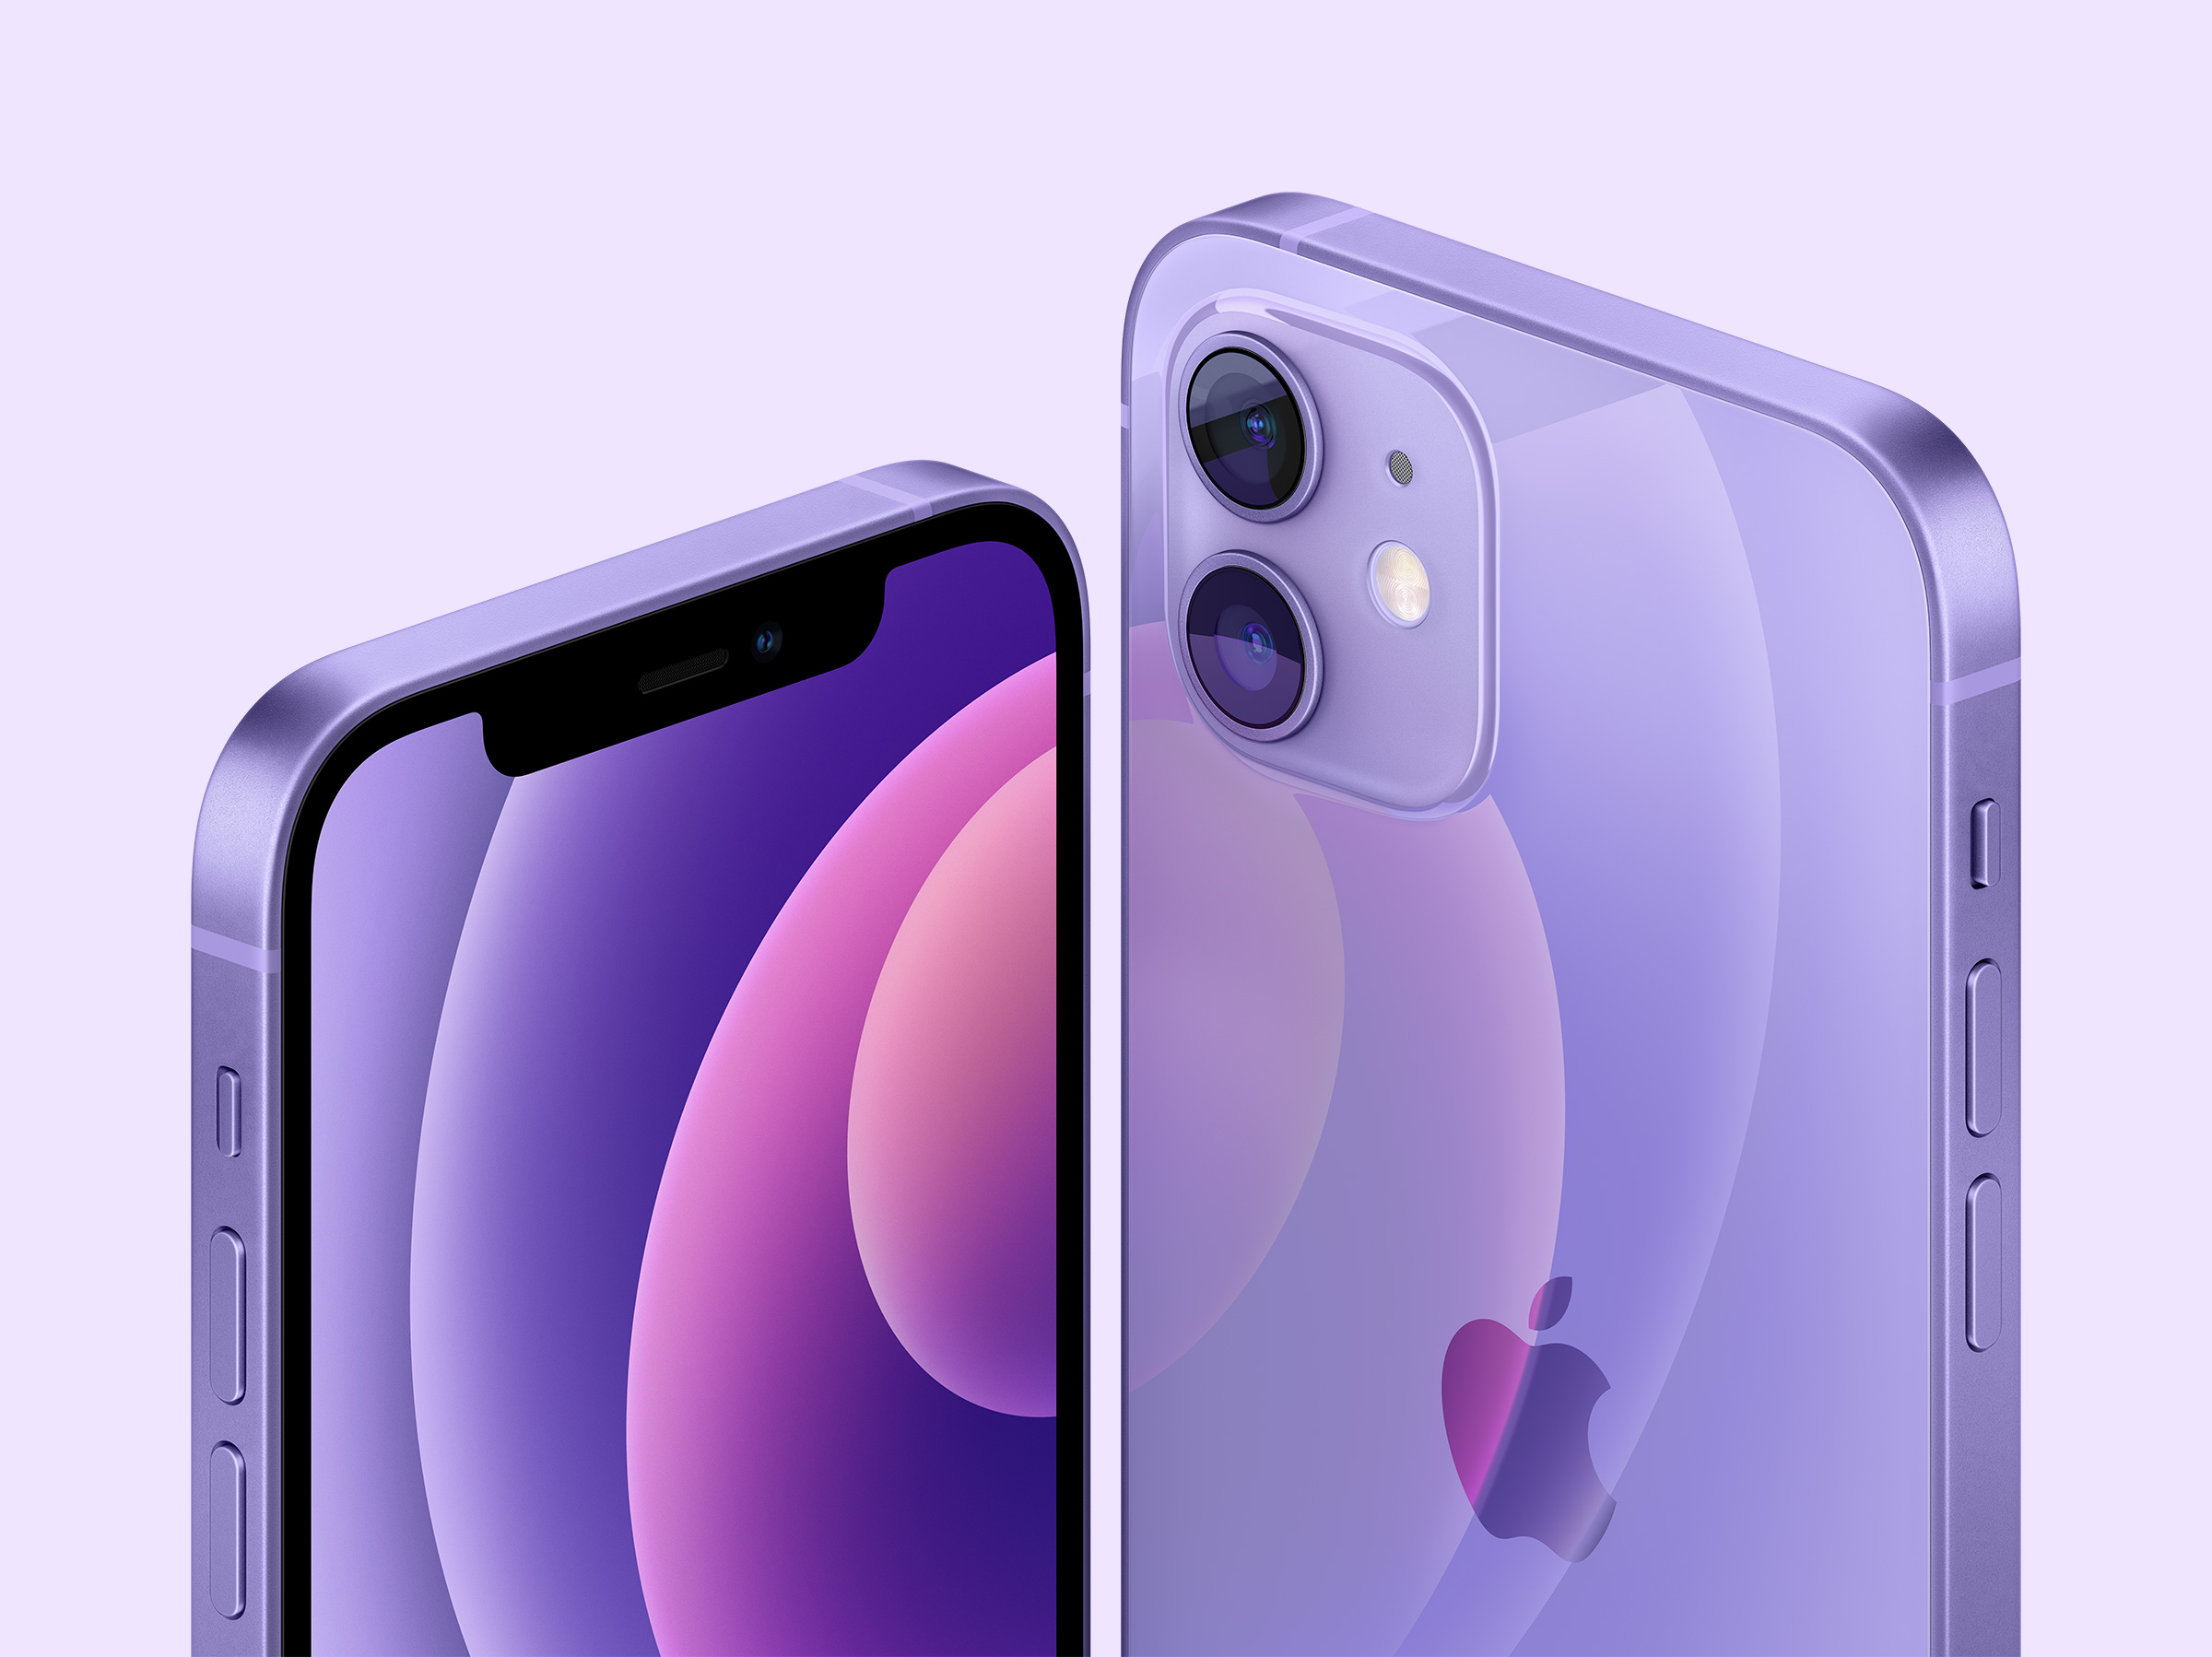 apple_iphone-12-spring21_purple_04202021